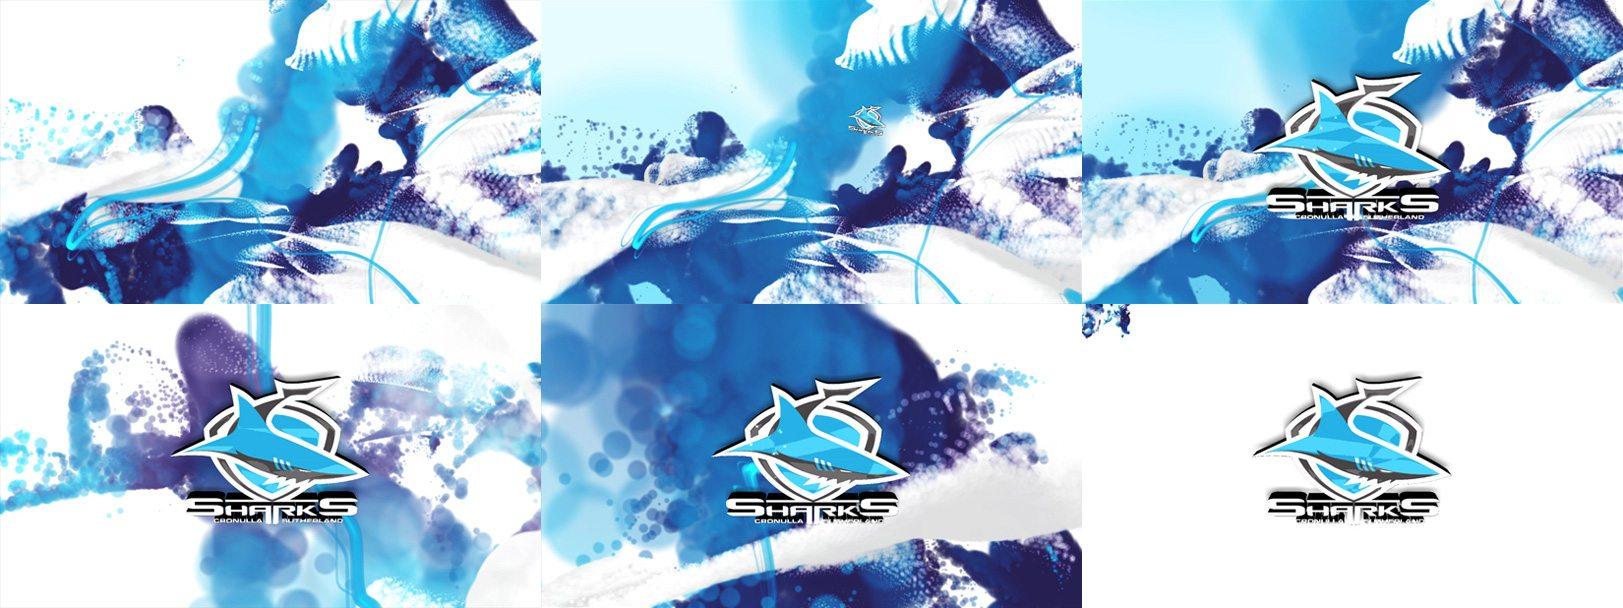 Cronulla Sharks - Cronulla Web Design - Graphic Design Caringbah